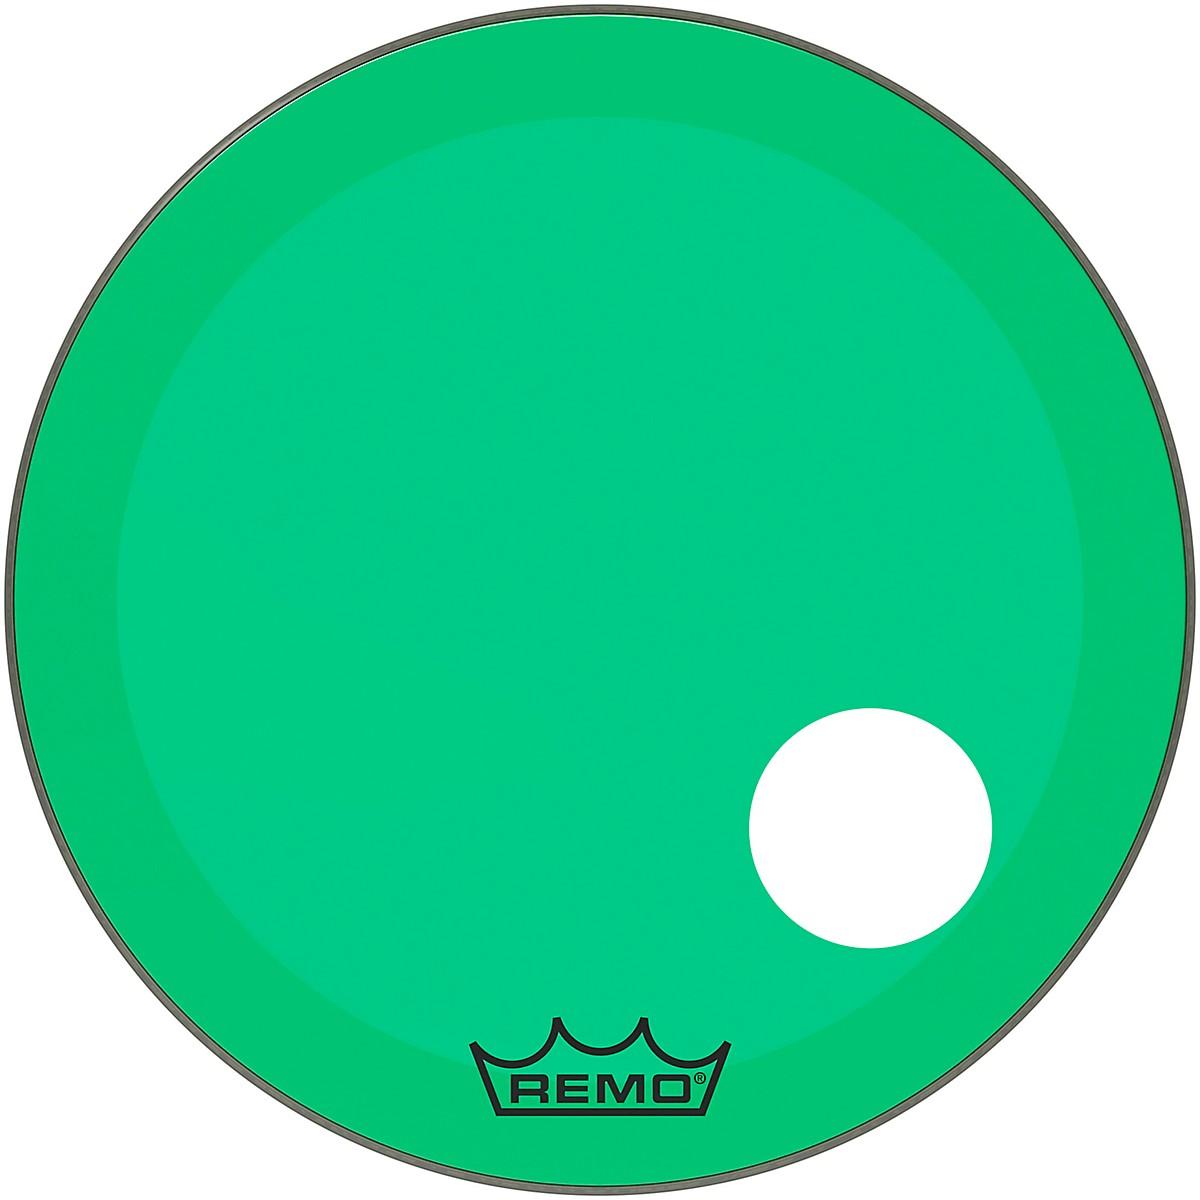 Remo Powerstroke P3 Colortone Green Resonant Bass Drum Head 5